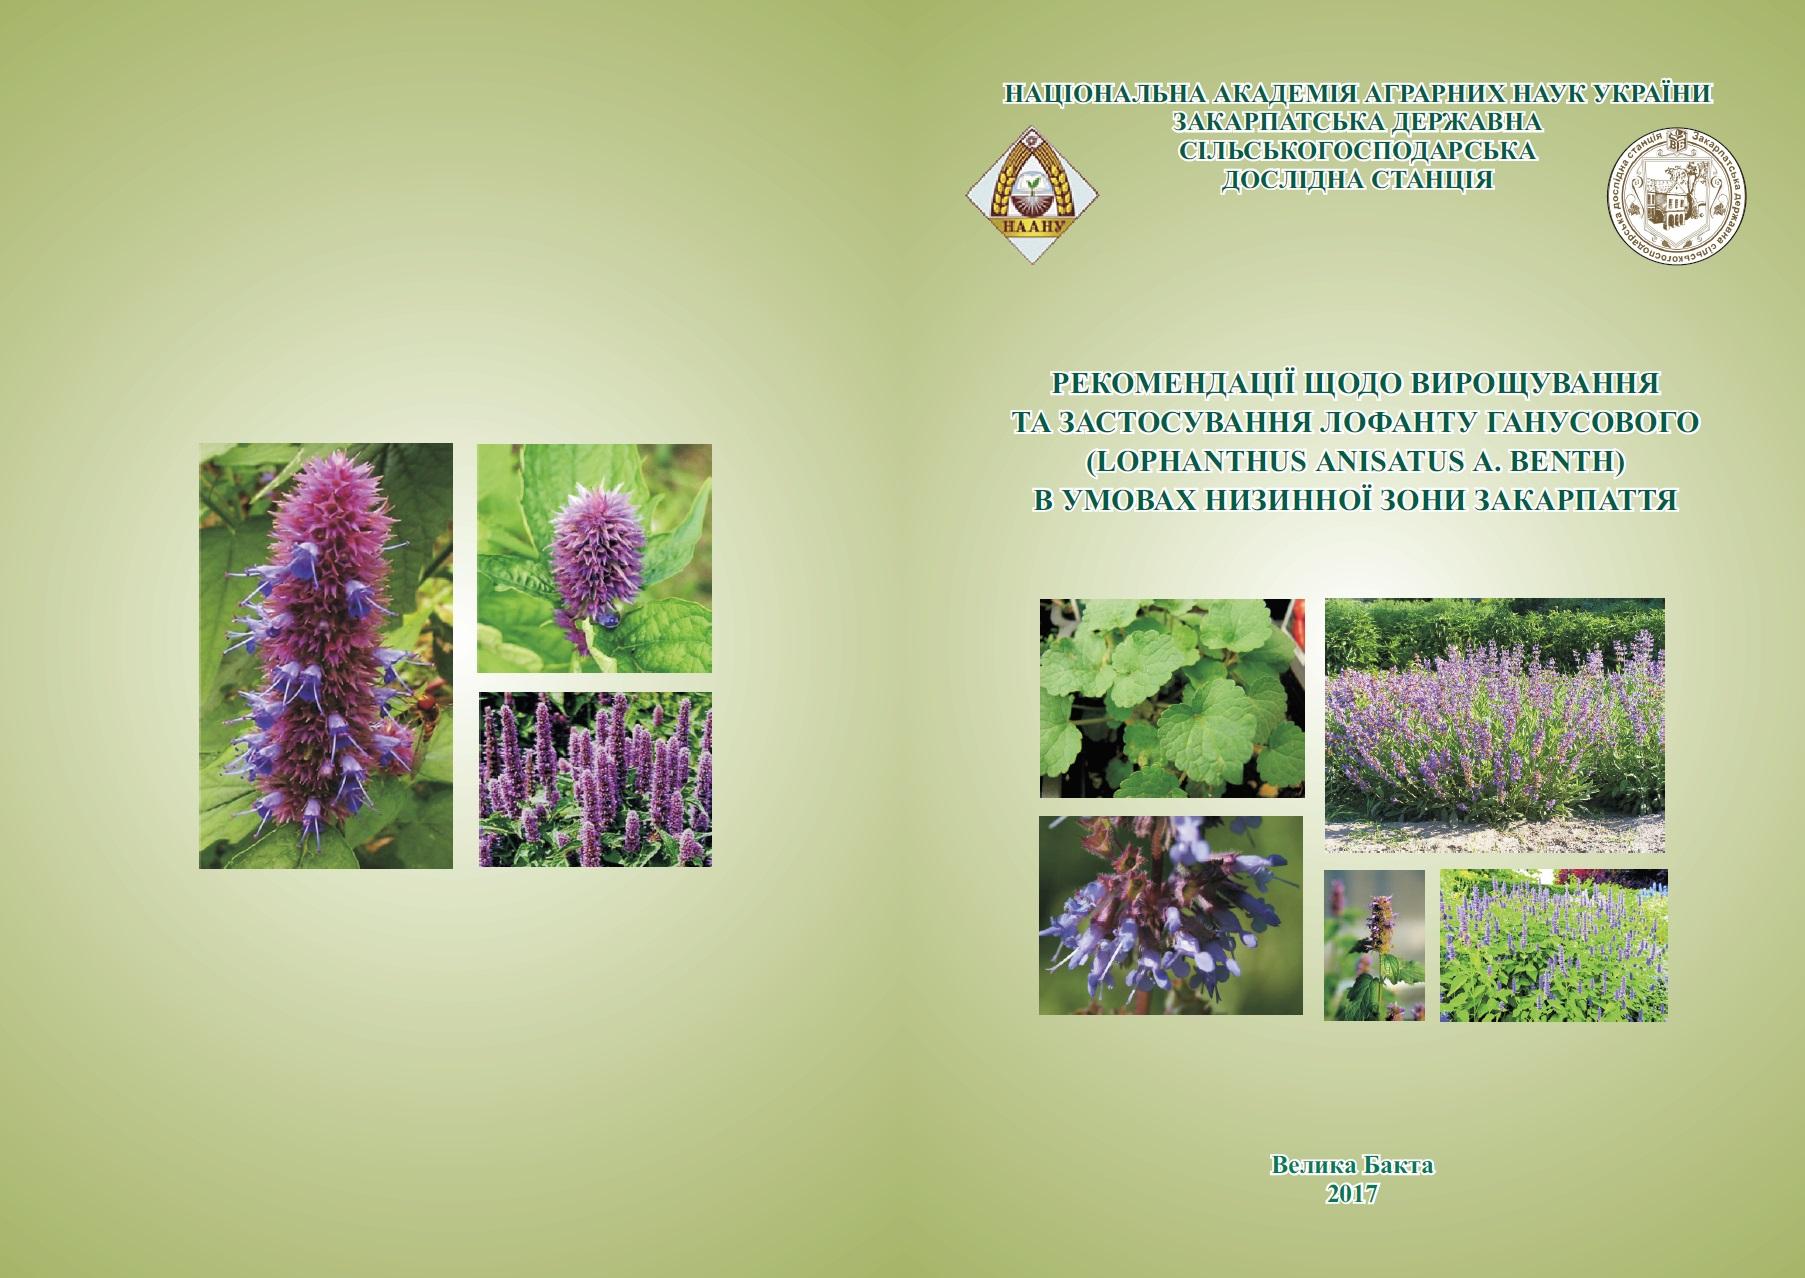 https://insbakta.org.ua/wp-content/uploads/2020/05/3253445754-11.jpg